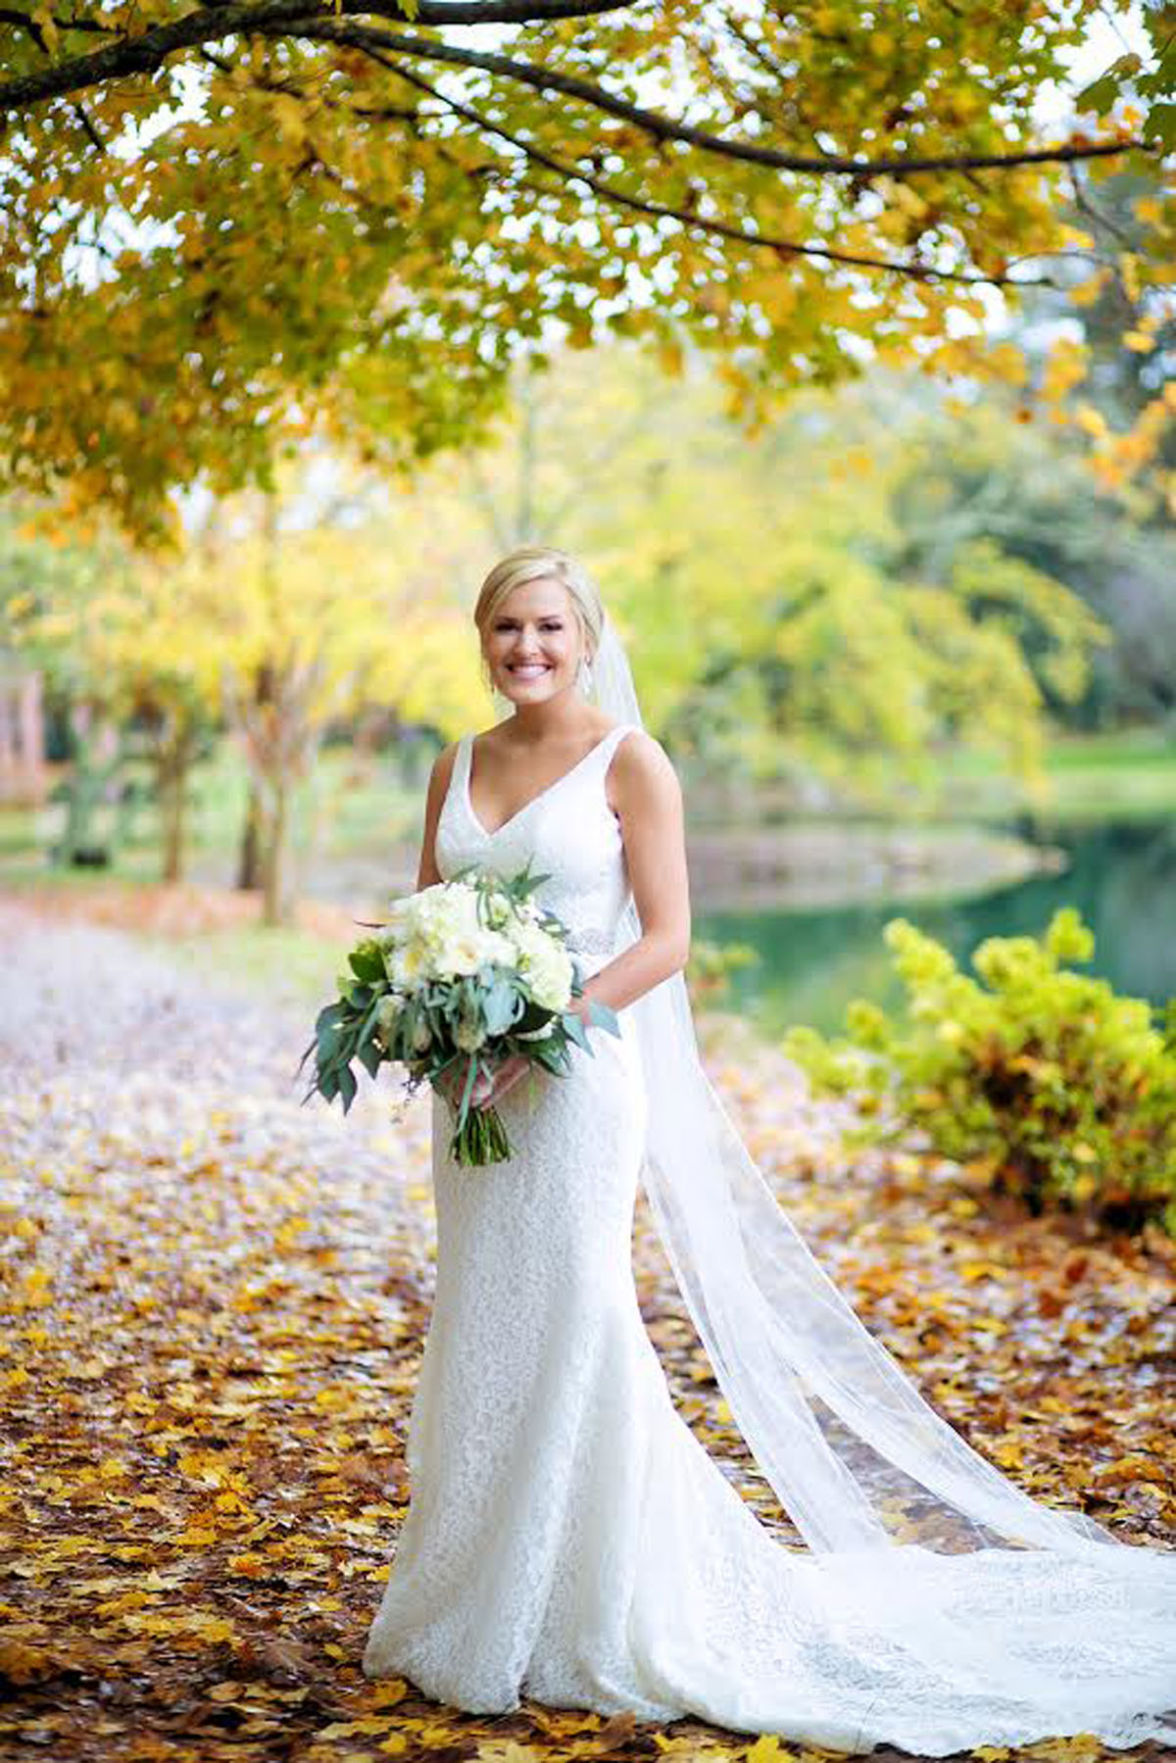 Mrs. Christopher Ryan Congdon